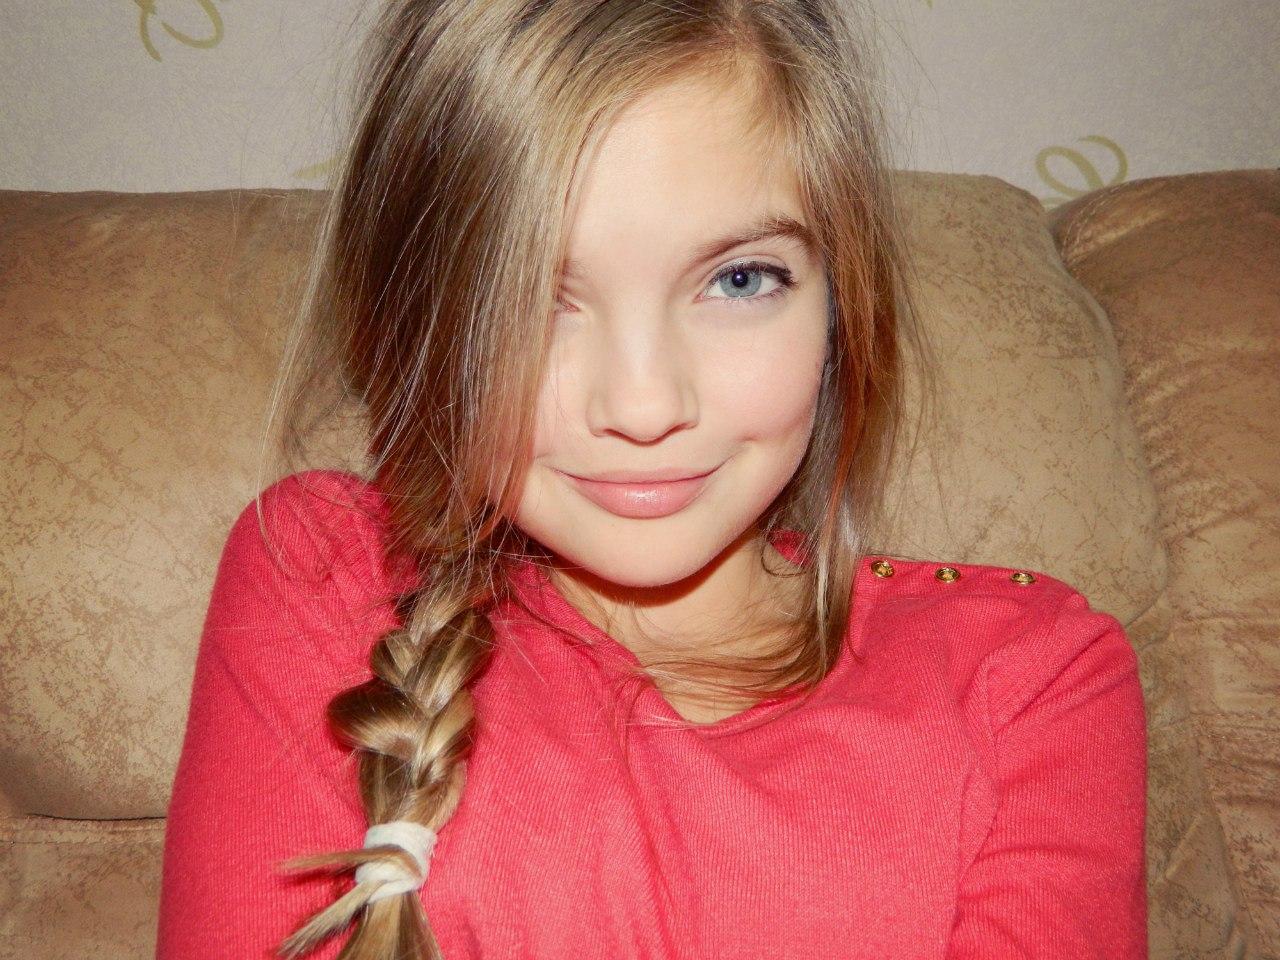 Фото девушек домашних условиях 12 лет